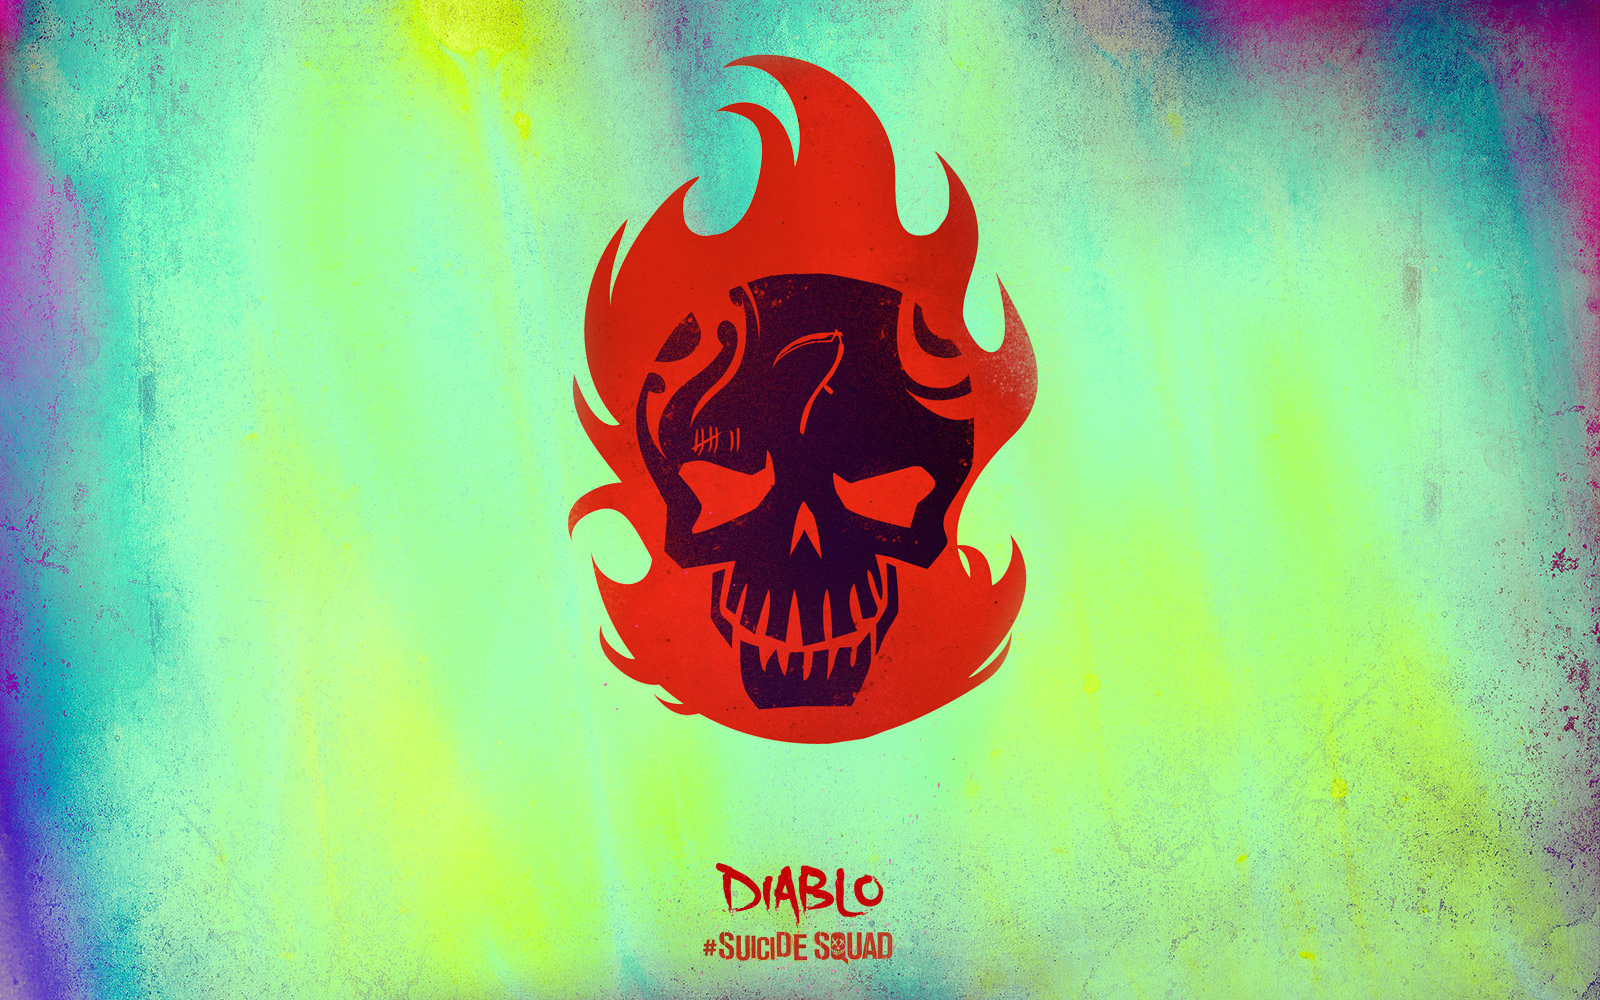 Suicide Squad Skull Wallpaper   Diablo   Suicide Squad Wallpaper 1600x1000